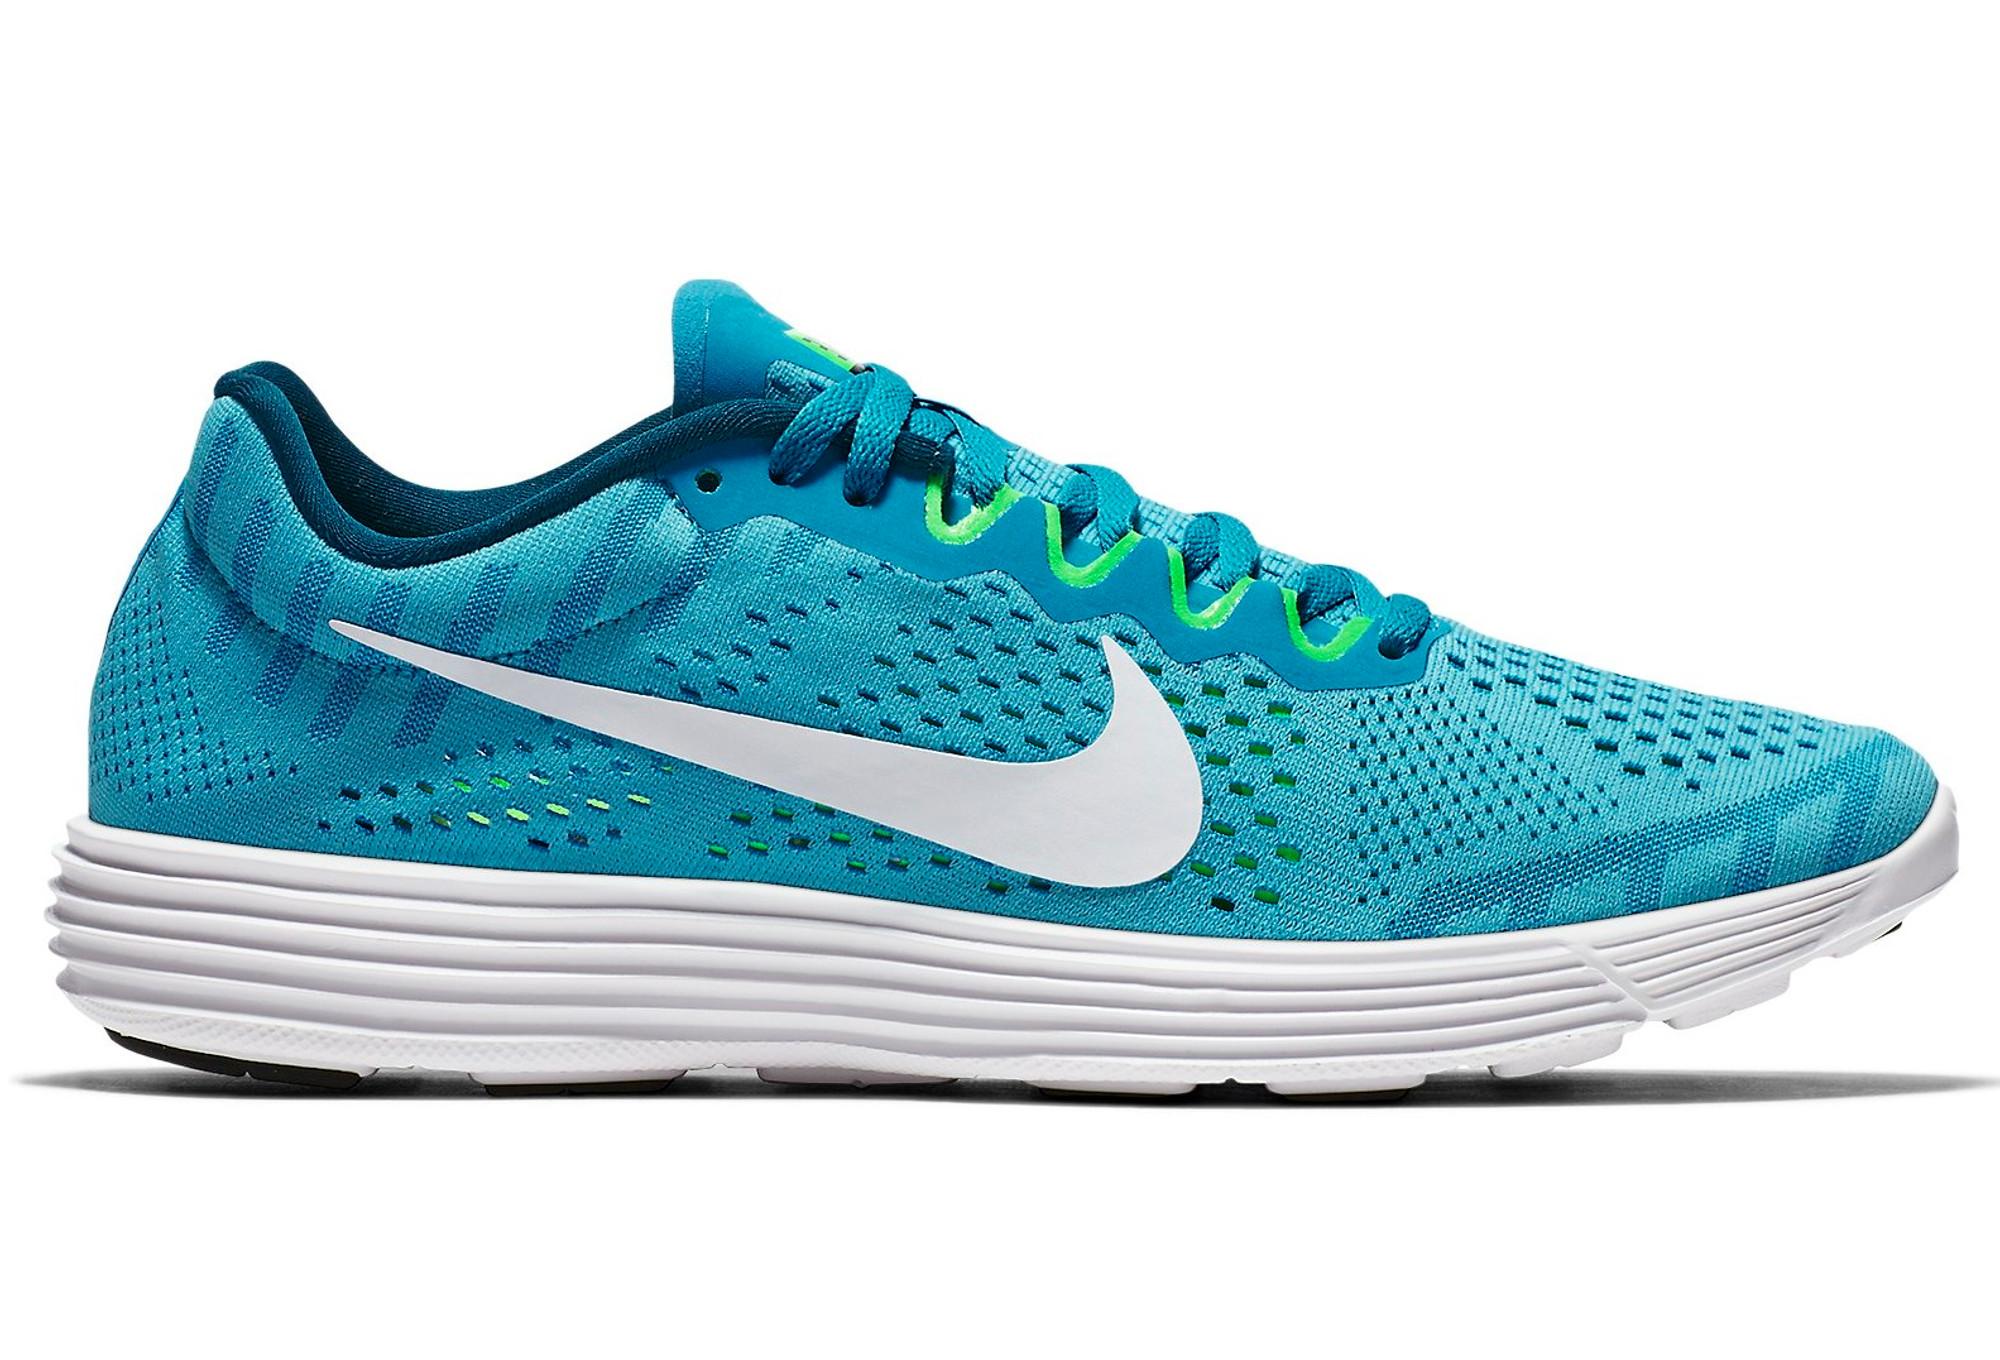 a66cfea9b14b34 Nike Lunaracer 4 Blue Unisex